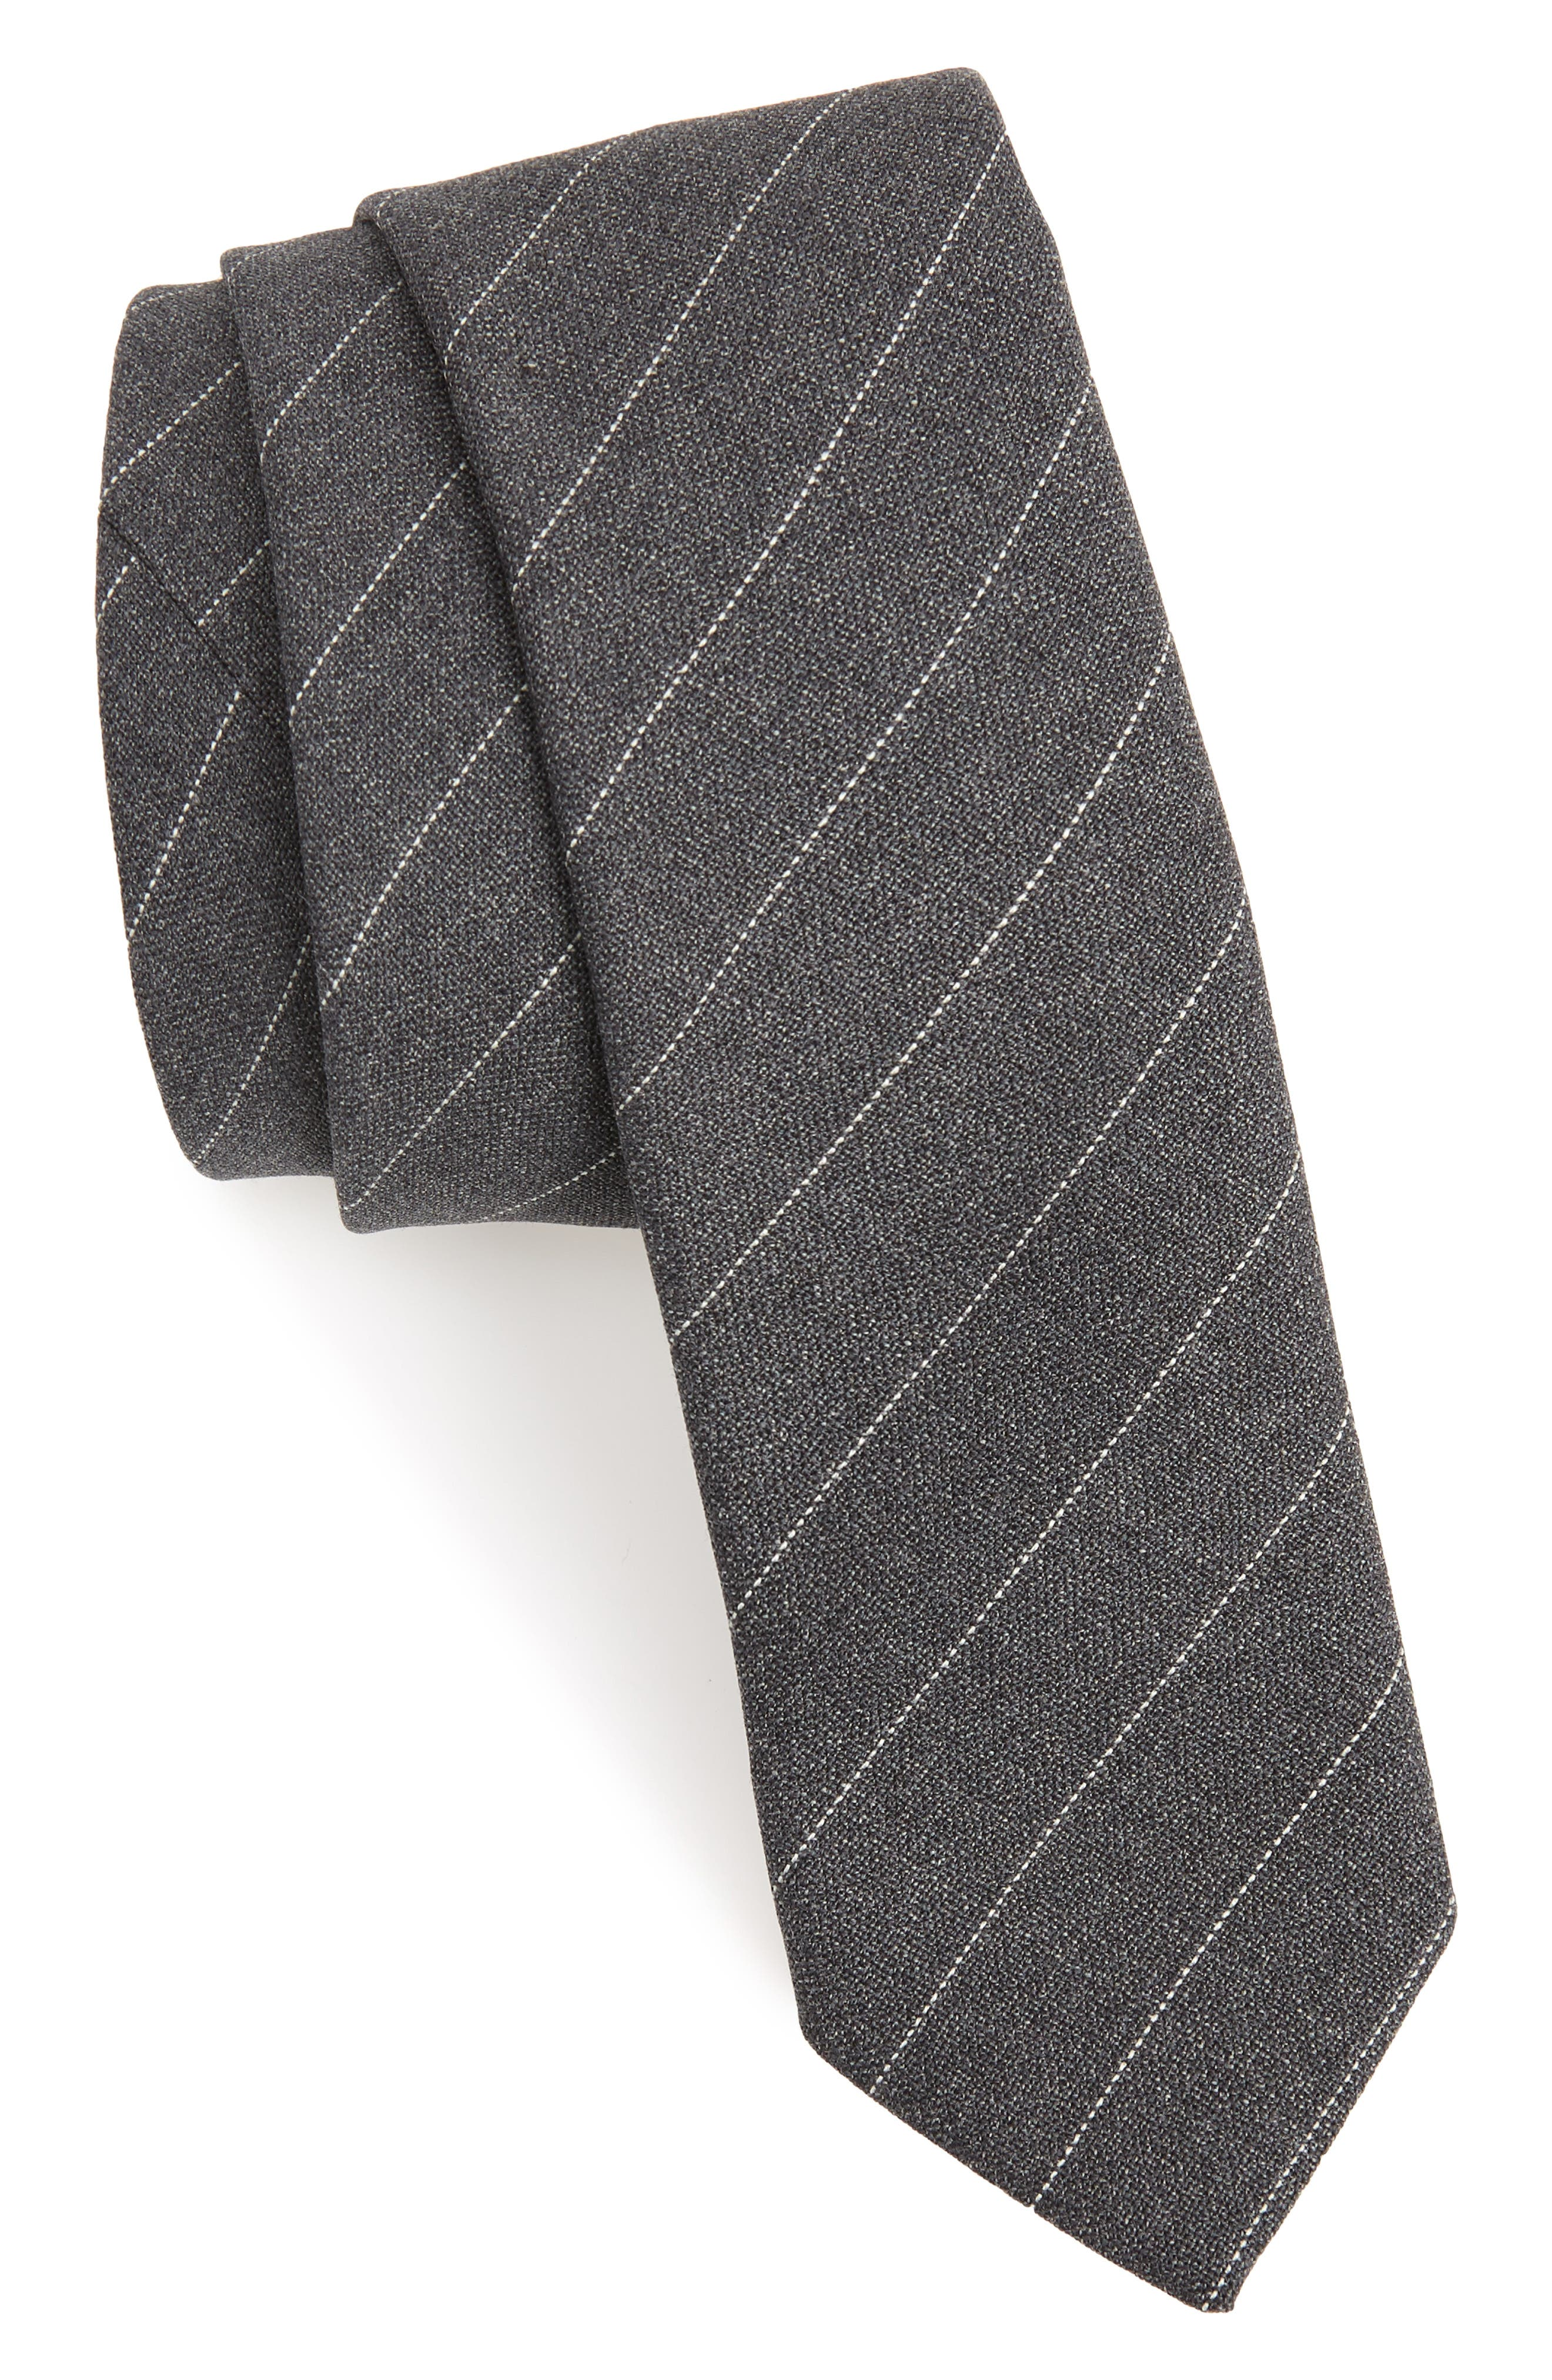 Stripe Wool Tie,                             Main thumbnail 1, color,                             DARK GREY